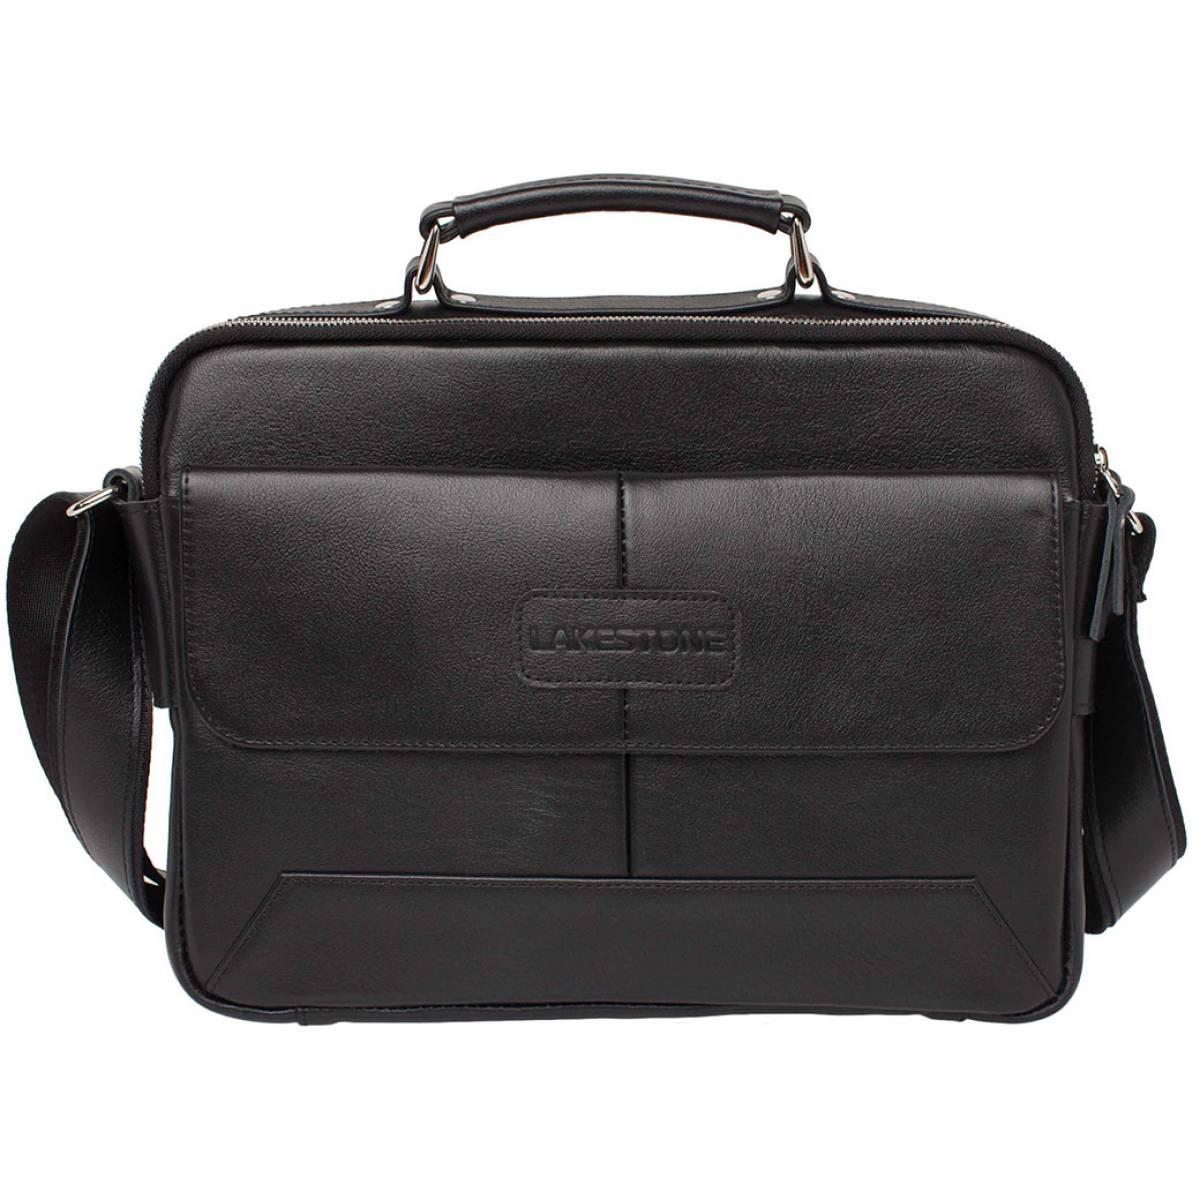 Кожаная мужская сумка мессенджер Button Black